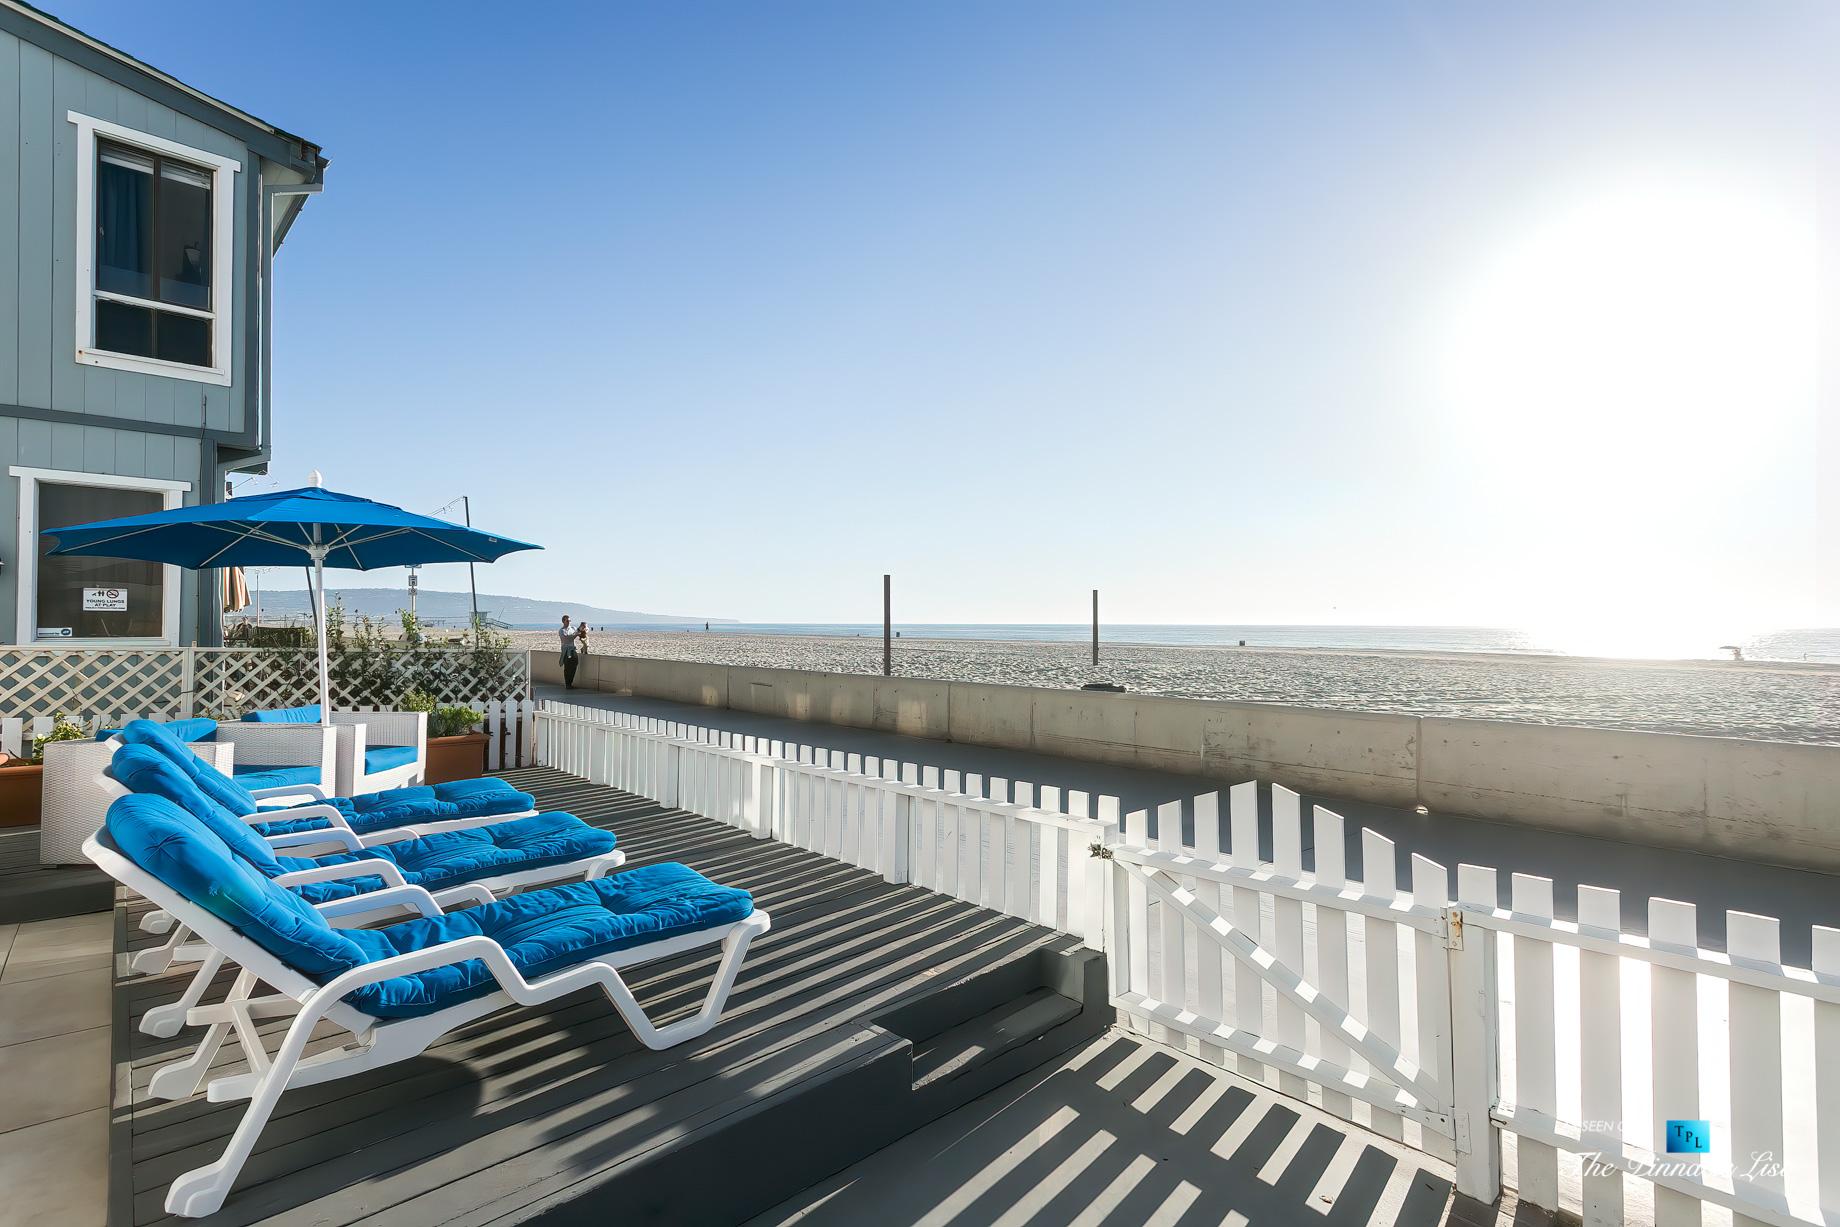 3500 The Strand, Hermosa Beach, CA, USA – Beachfront Sundeck – Luxury Real Estate – Original 90210 Beach House – Oceanfront Home